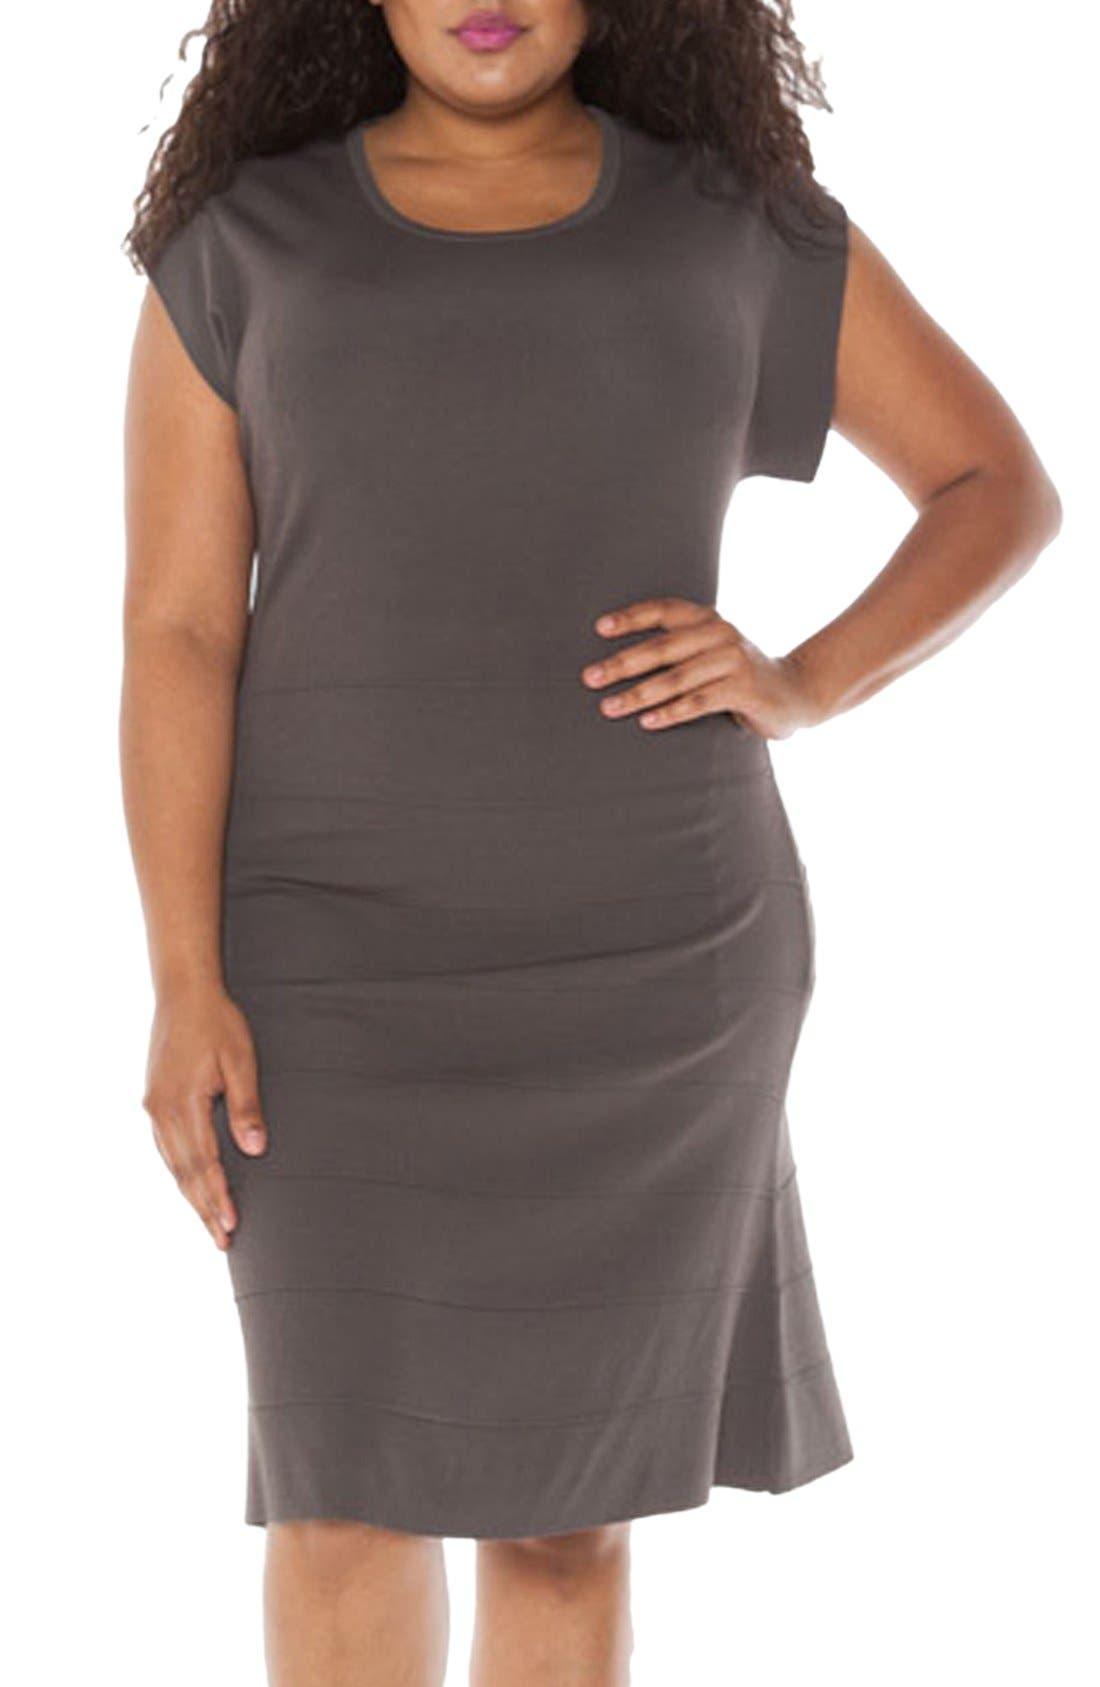 SLINK Jeans Cap Sleeve Knit A-Line Dress (Plus Size)